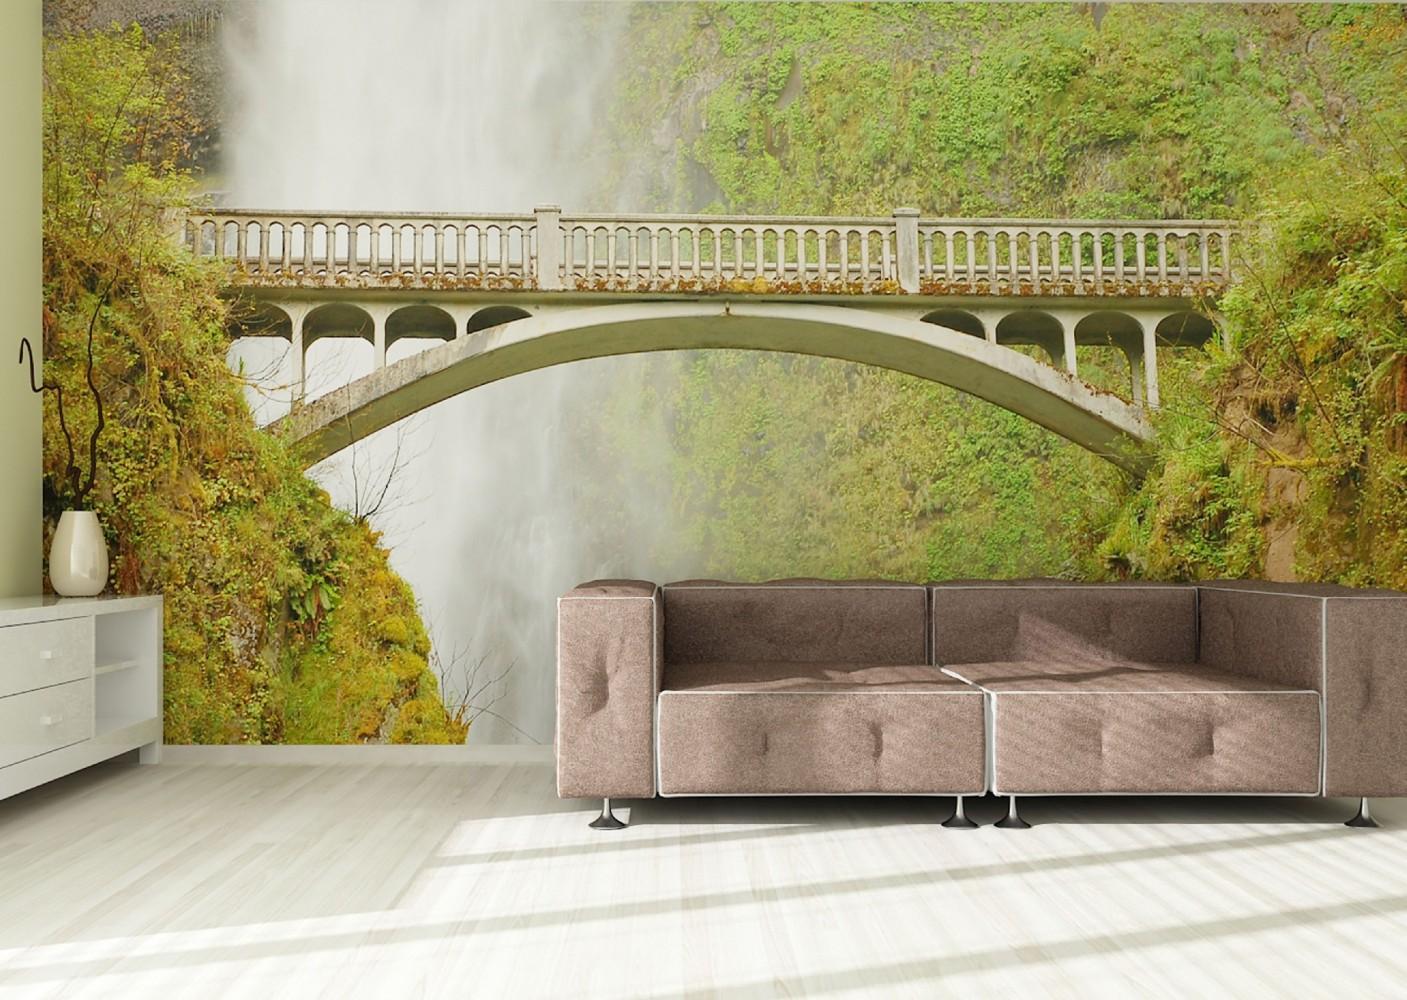 Wall mural wallpaper nature wildness bridge waterfall for Bridge wall mural